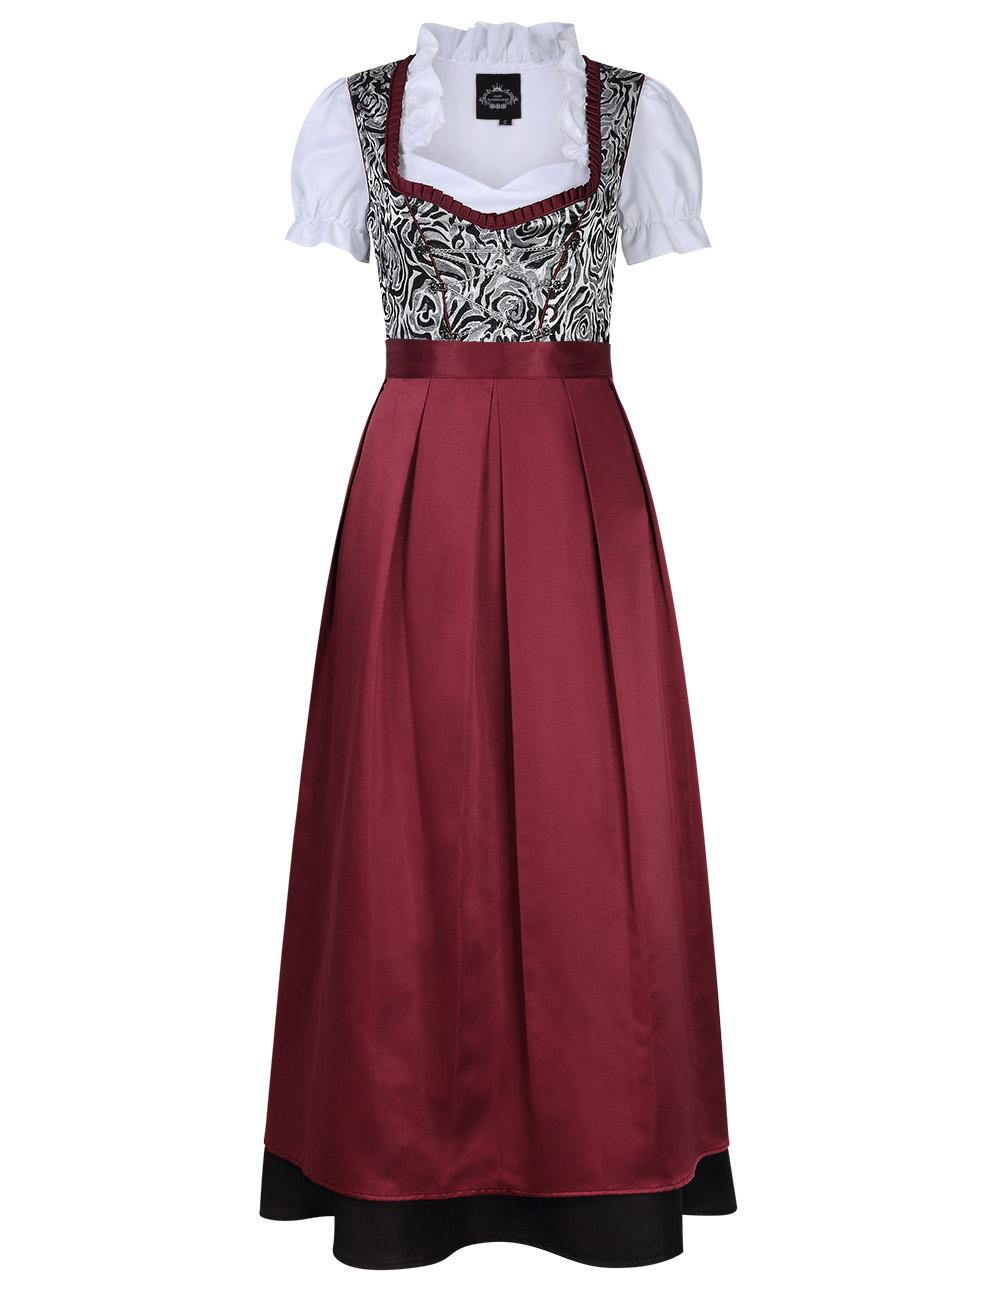 Women's German Traditional Oktoberfest Costumes Classic Dress Three Pieces Suit